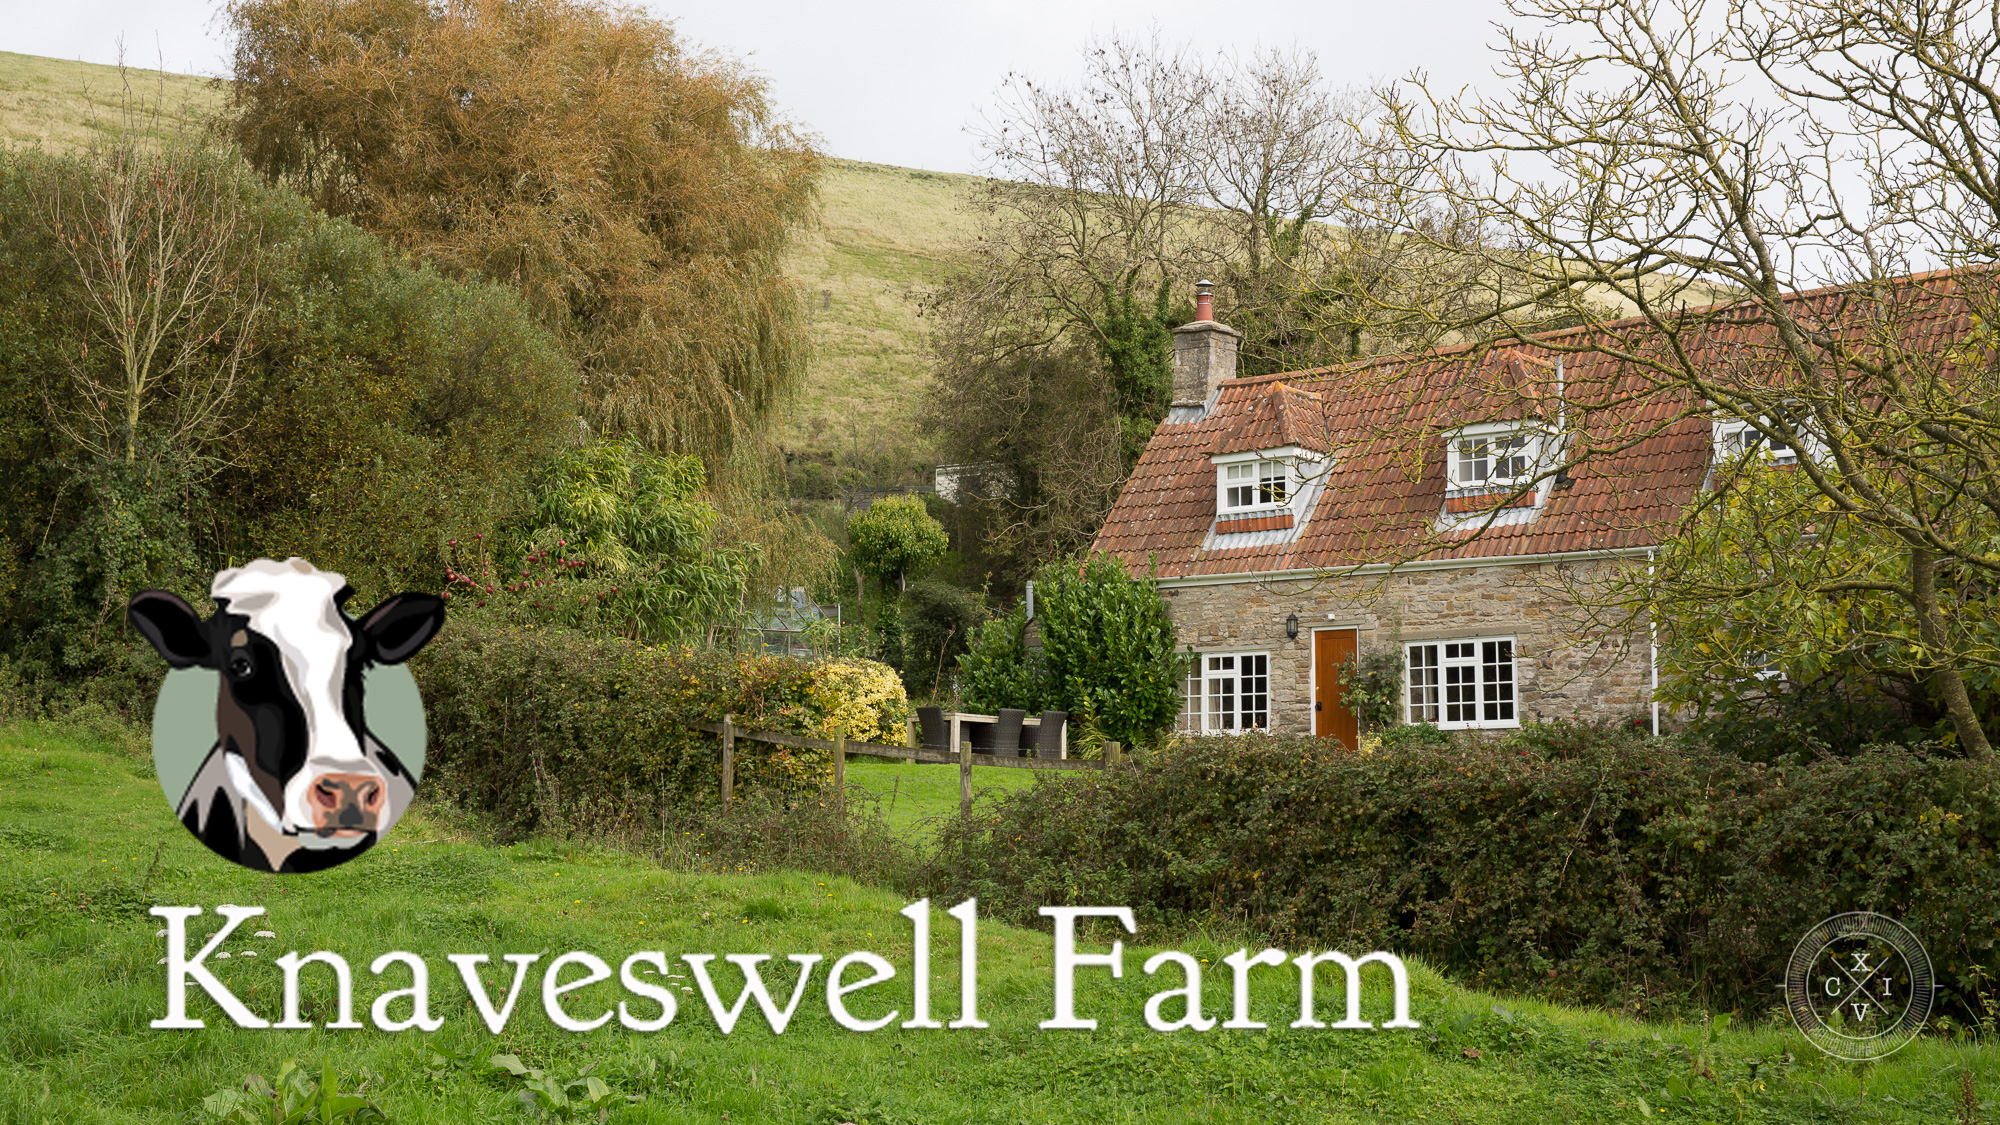 Knaveswell Farm | Swanage | Dorset